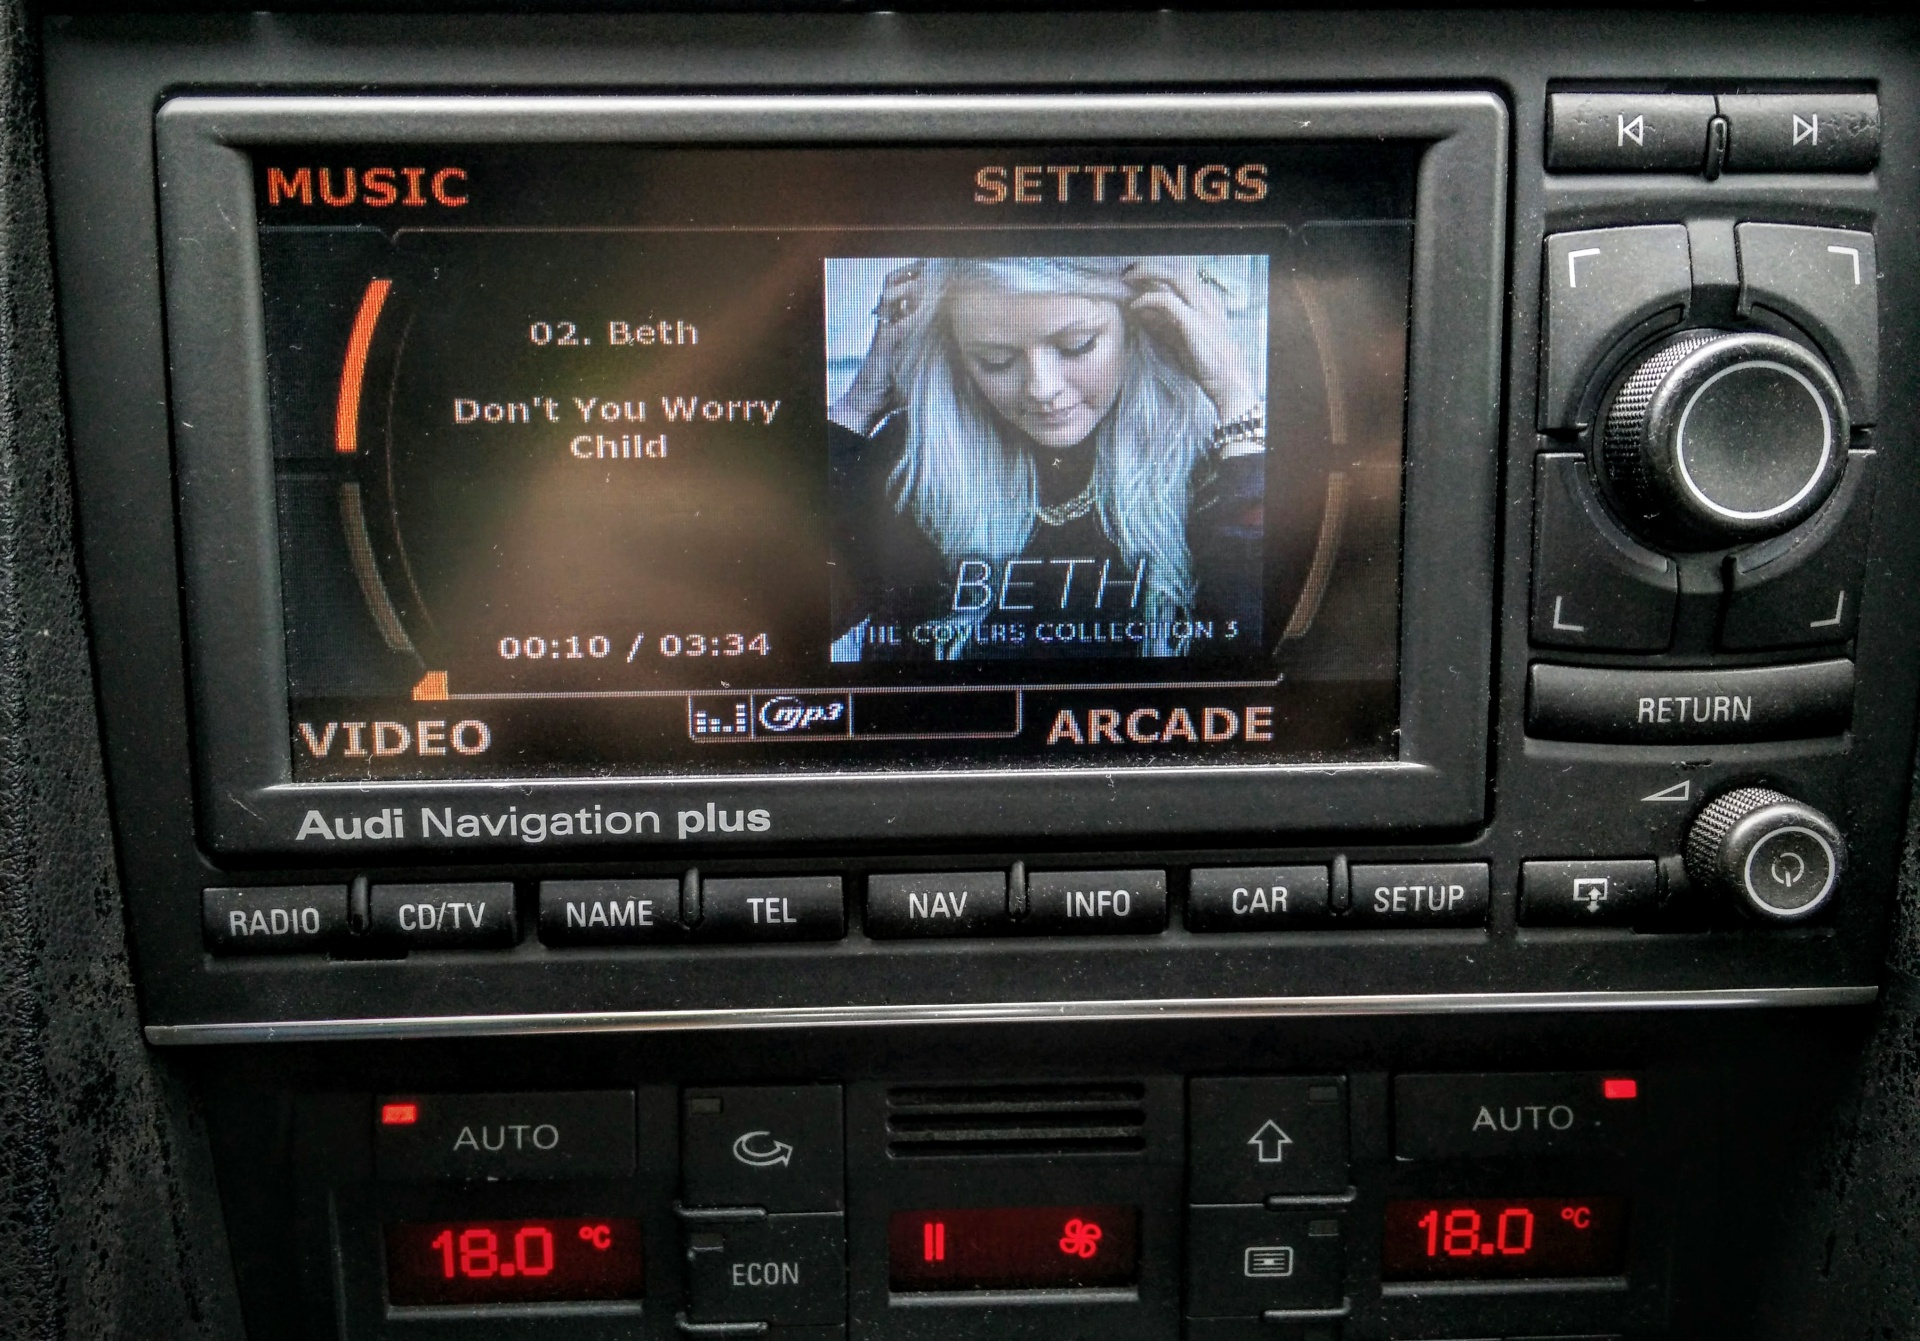 audi a4 a6 b6 b7 c5 rns e controlling raspberry pi 3 with kodi rh vaipui wordpress com Audi RNS-E PU Audi RNS-E Aux-Input